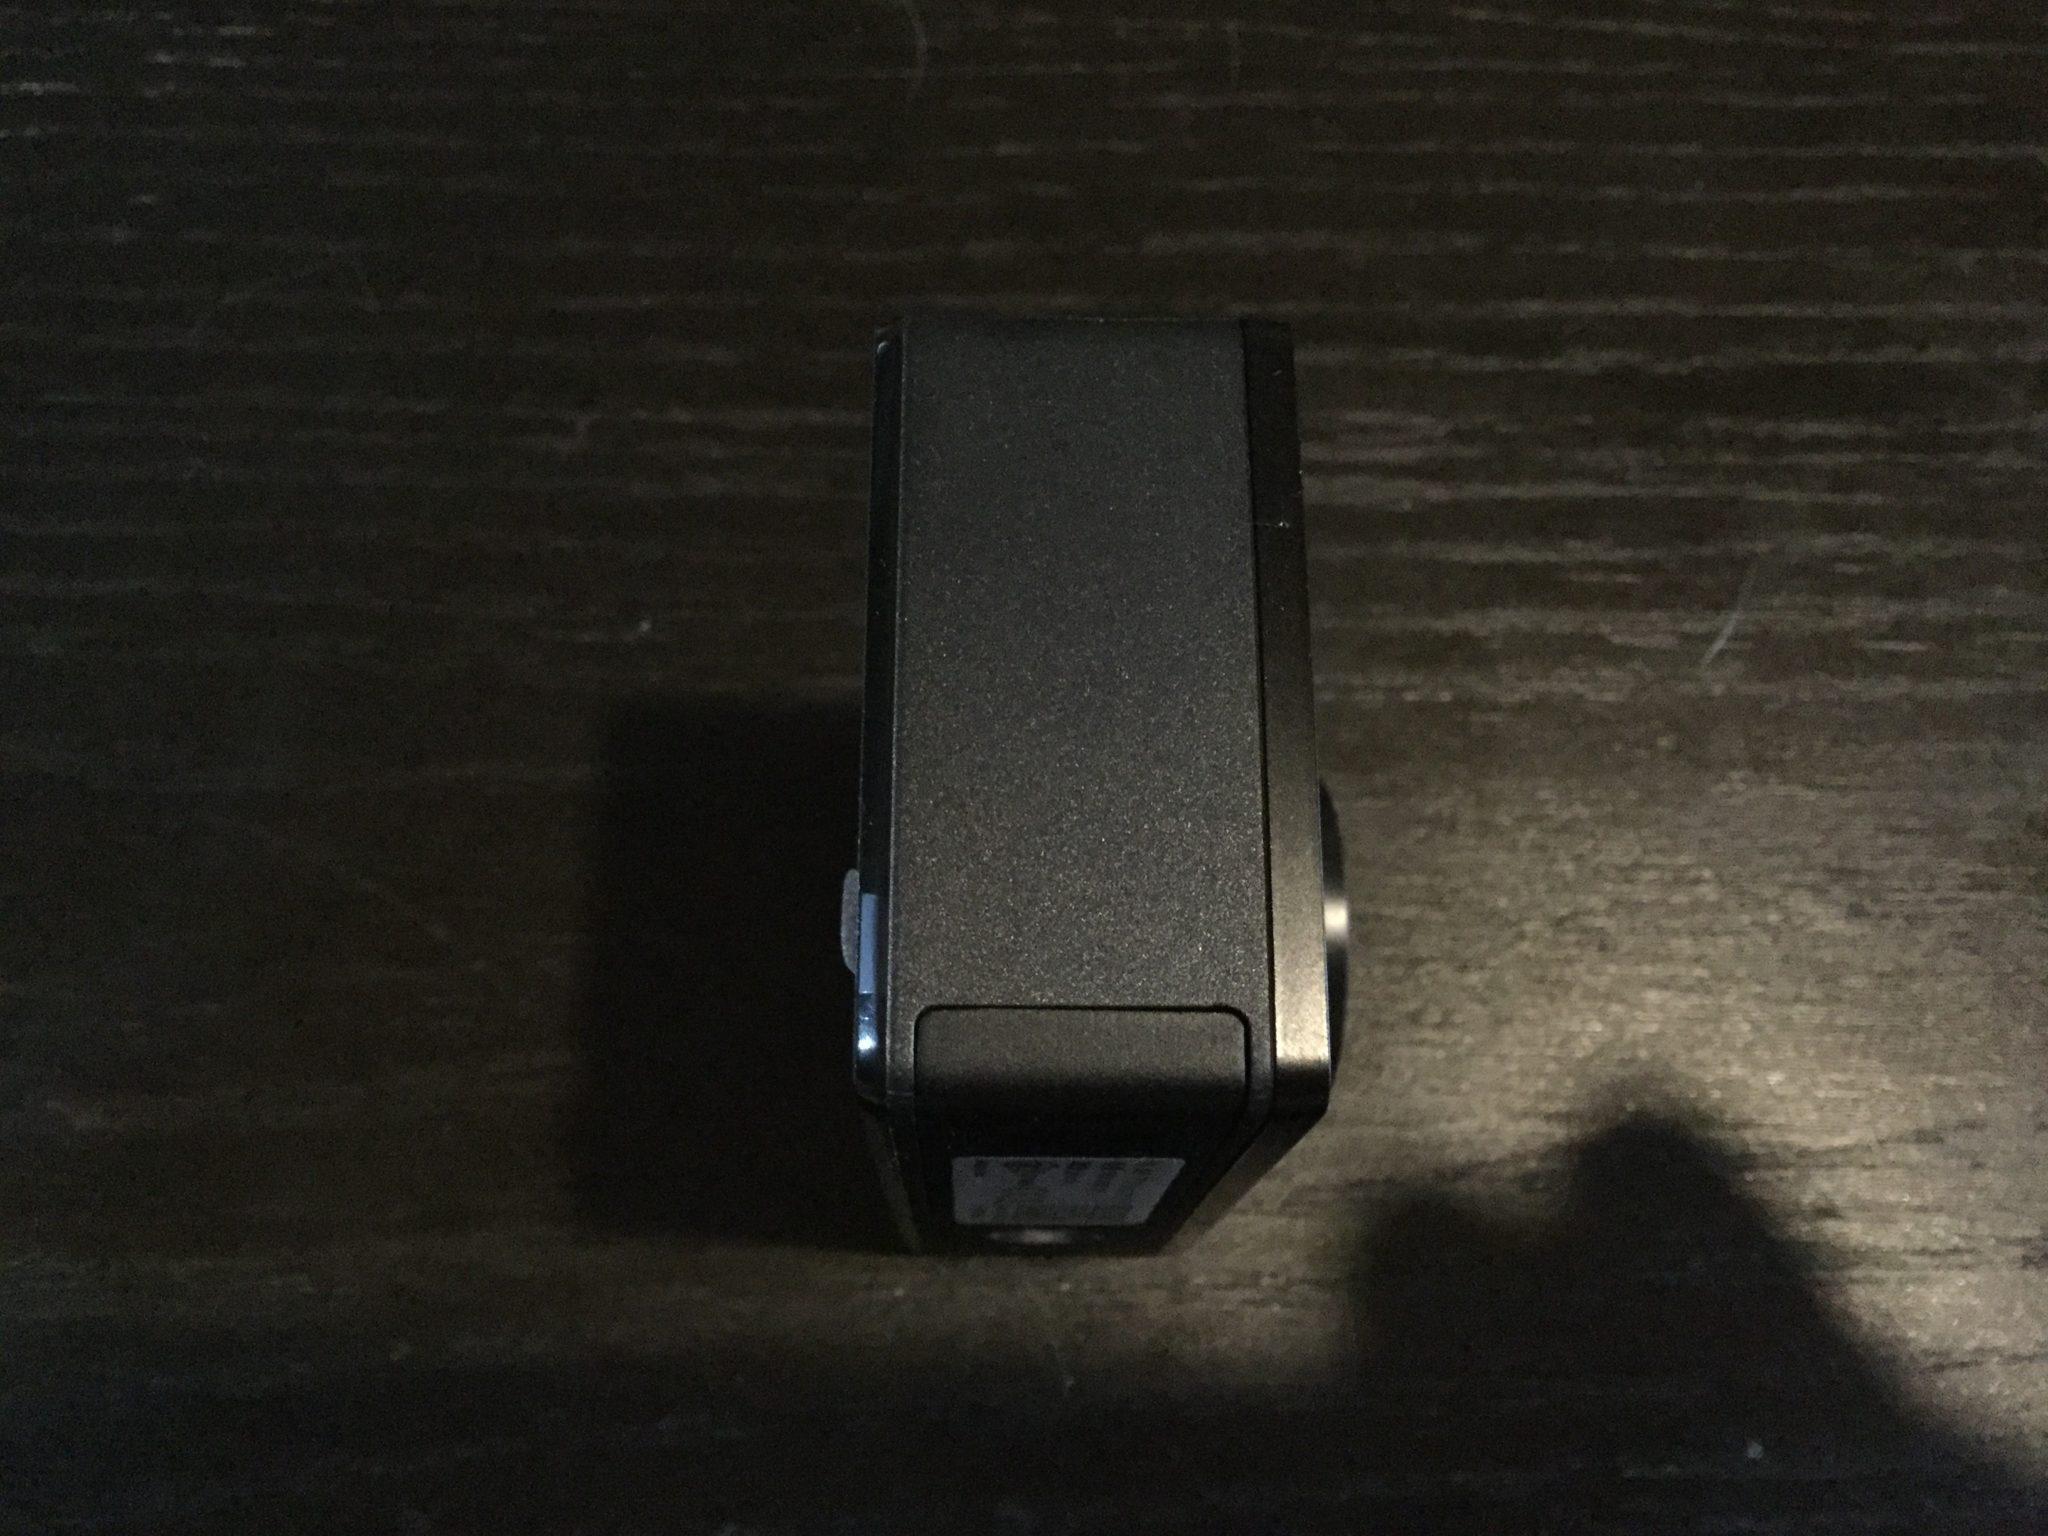 YI 4Kアクションカメラ